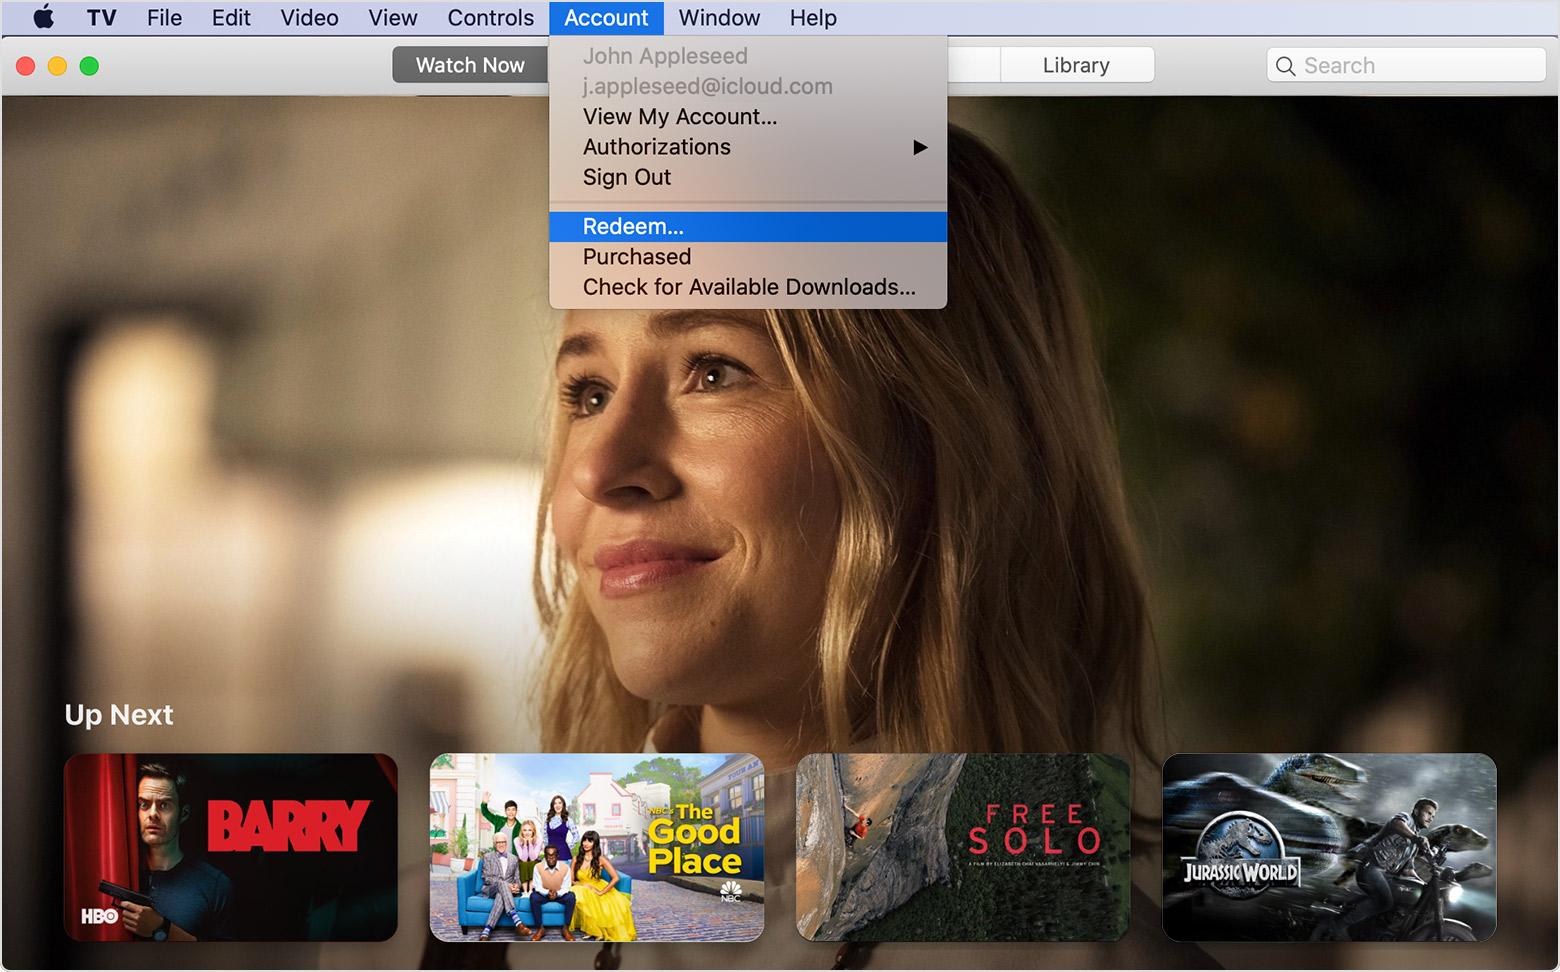 Redeem digital copies of DVDs or Blu-rays in the Apple TV